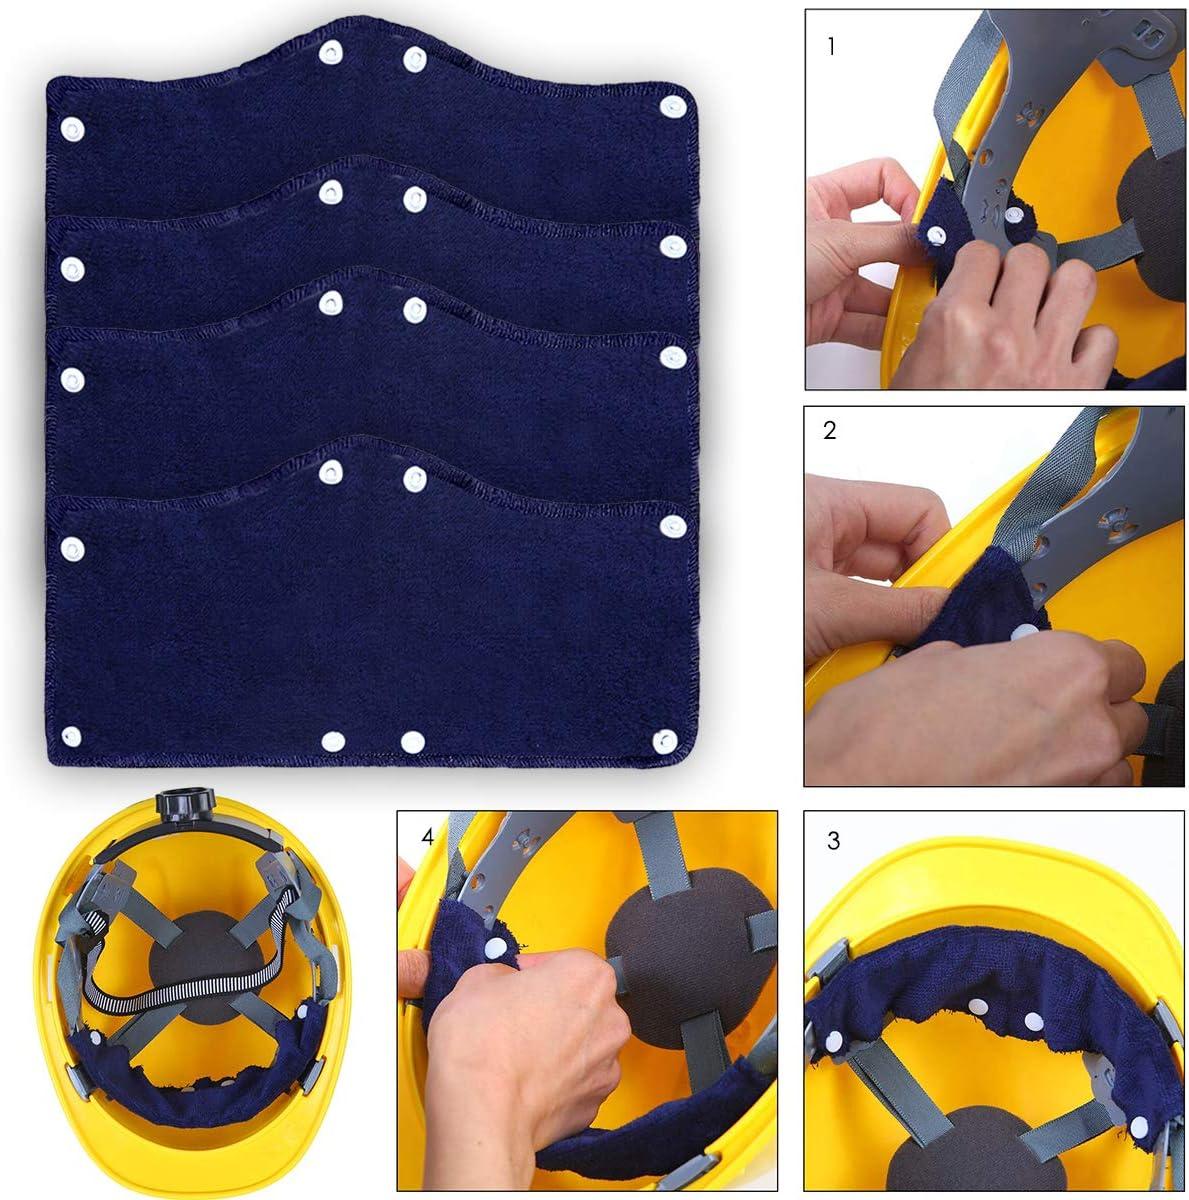 Josopa Hard Hat Sweatband Washable Hardhat Sweatband Liner Snap Absorb Sweat Band Hard Hat Accessories 6 Pack